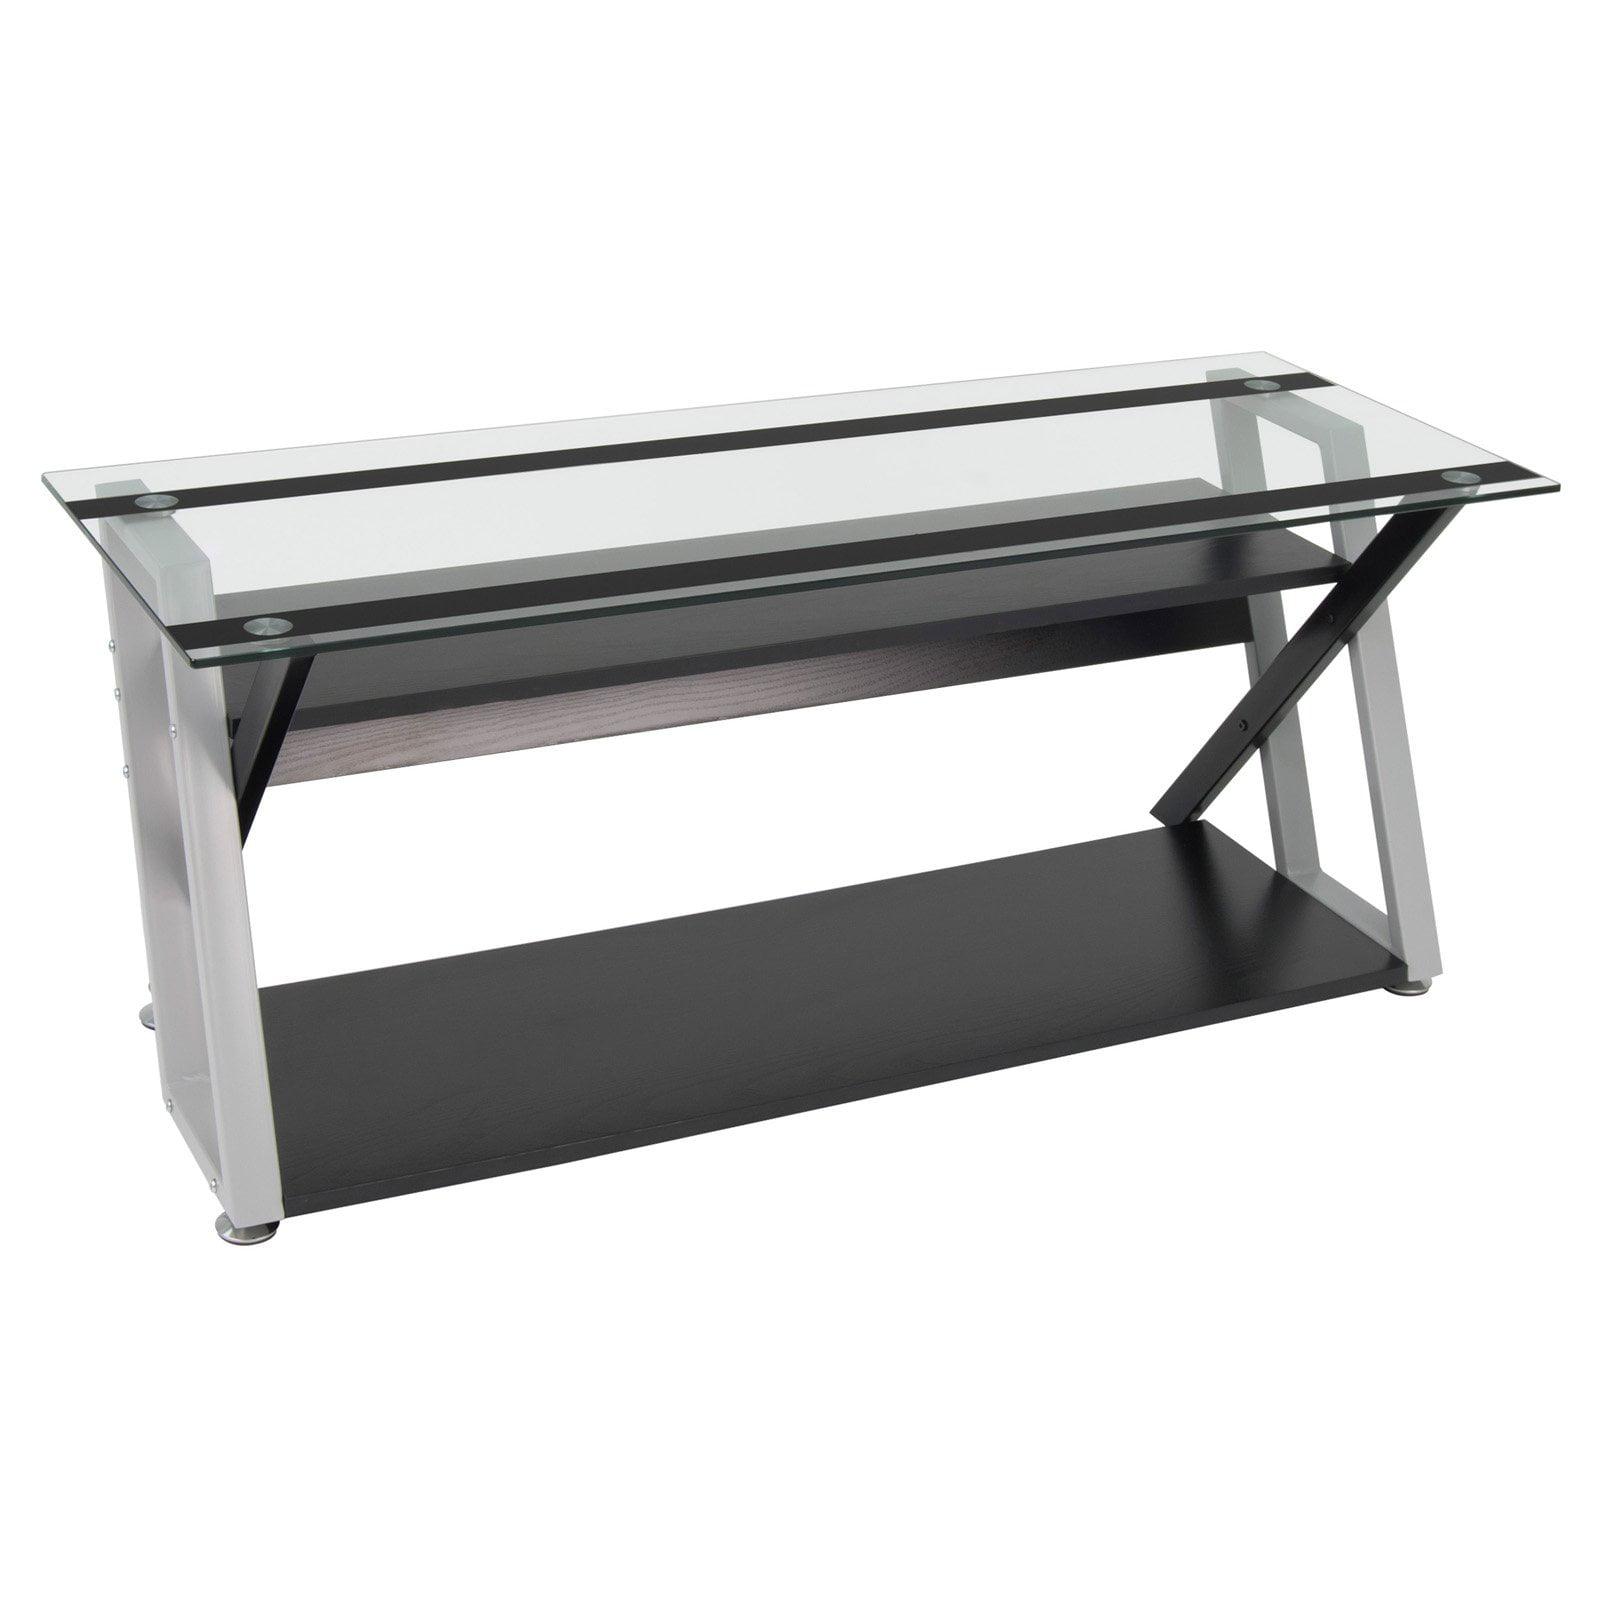 Calico Designs Colorado 56 Tv Stand Black Silver Clear Glass